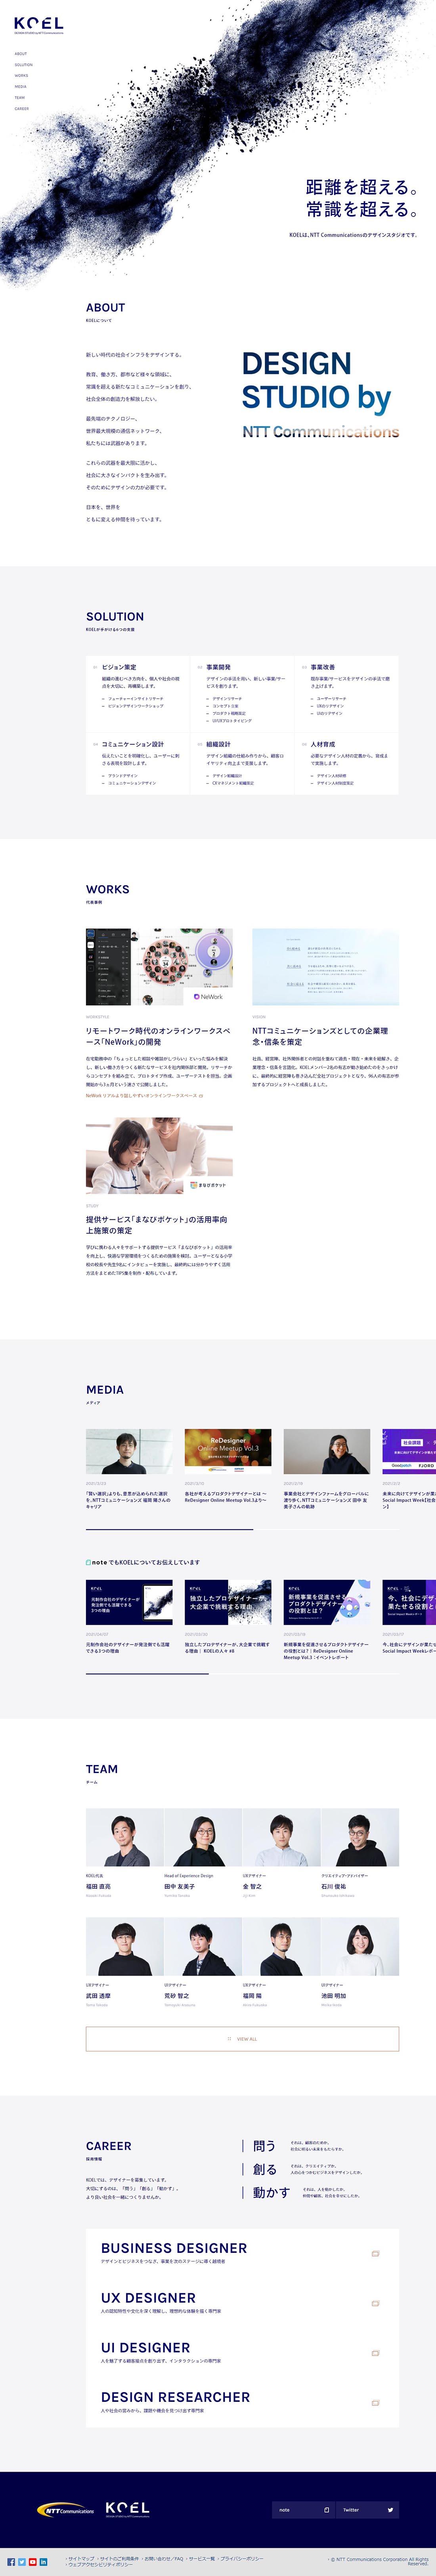 KOEL Design Studio by NTT Communications